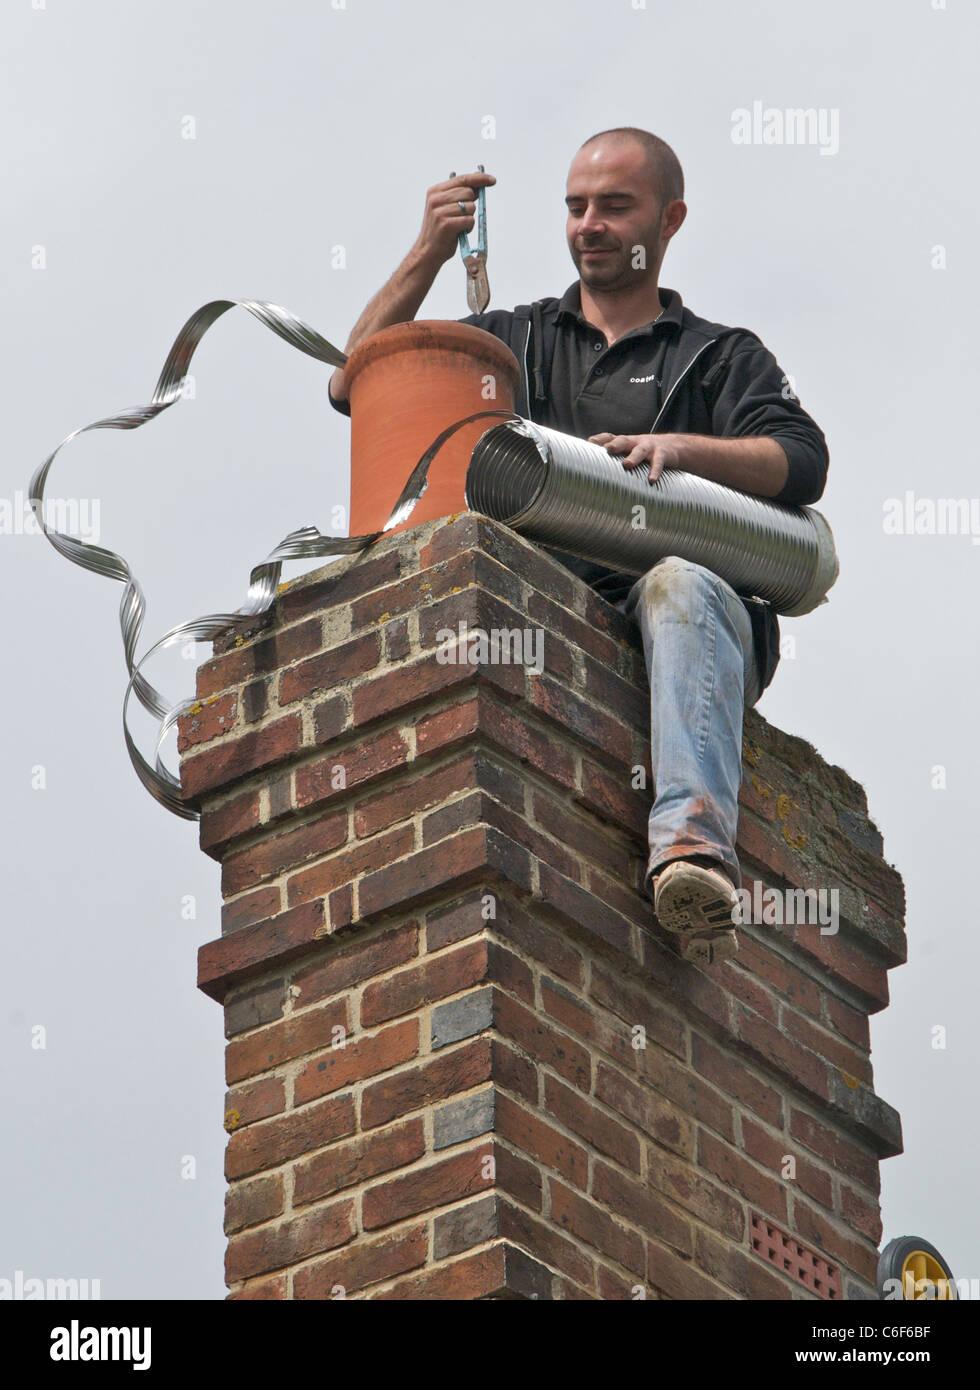 Lining a chimney for wood burning - Stock Image